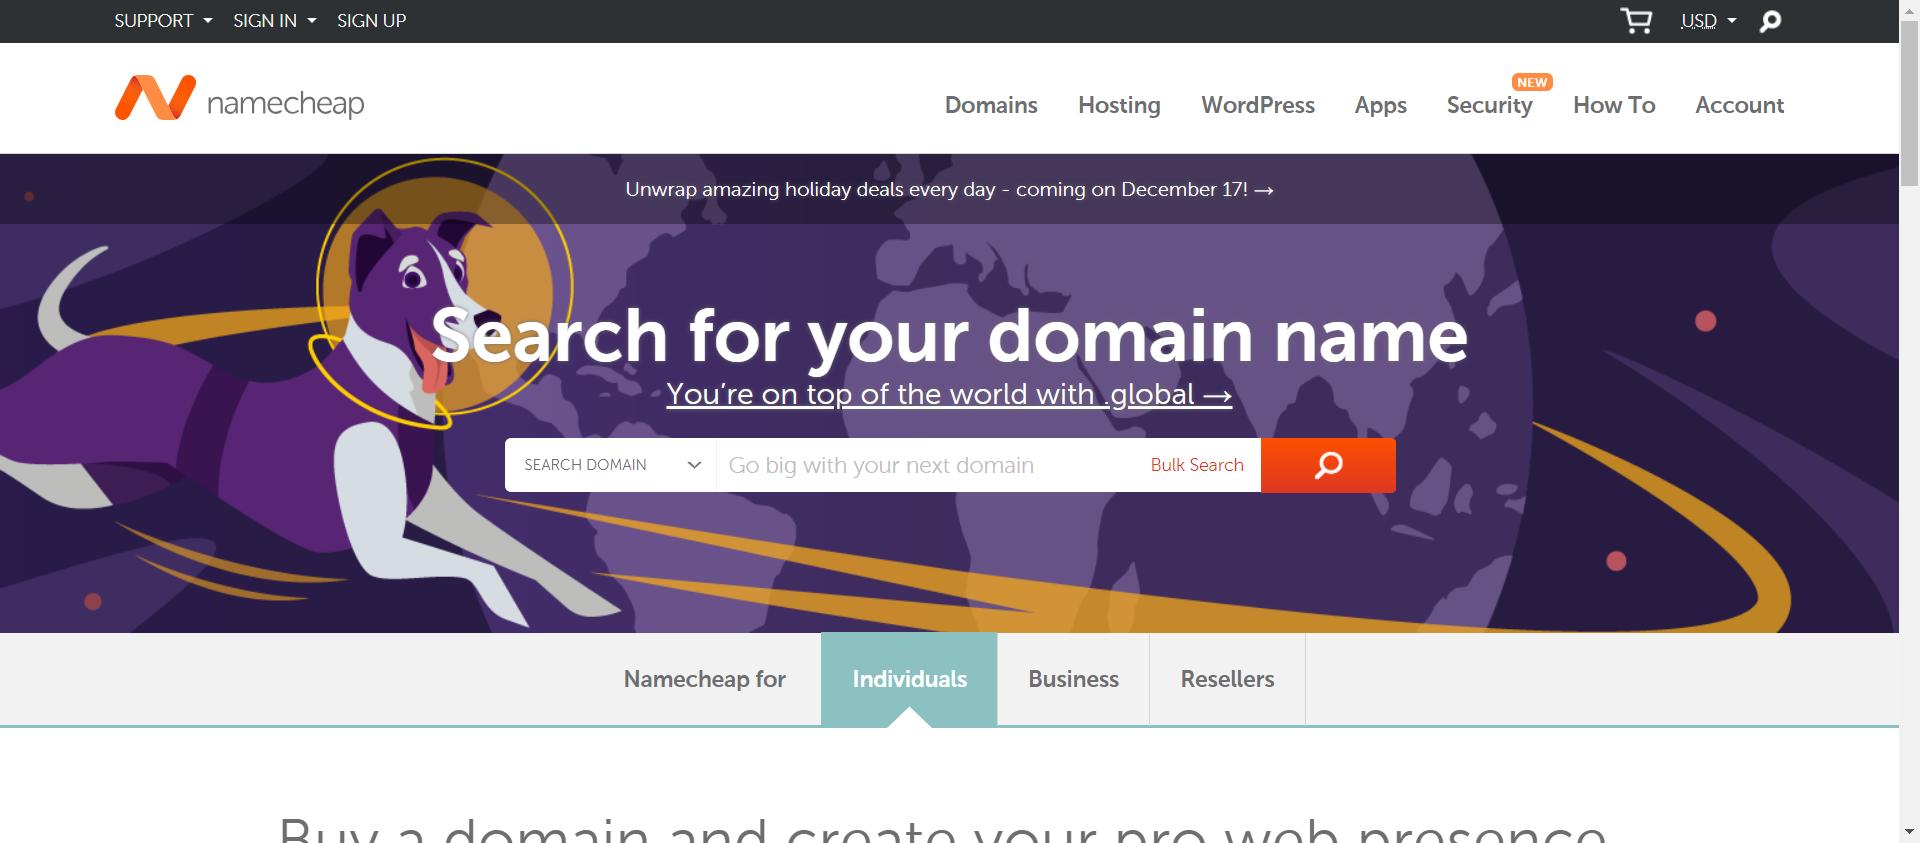 Namecheap website image